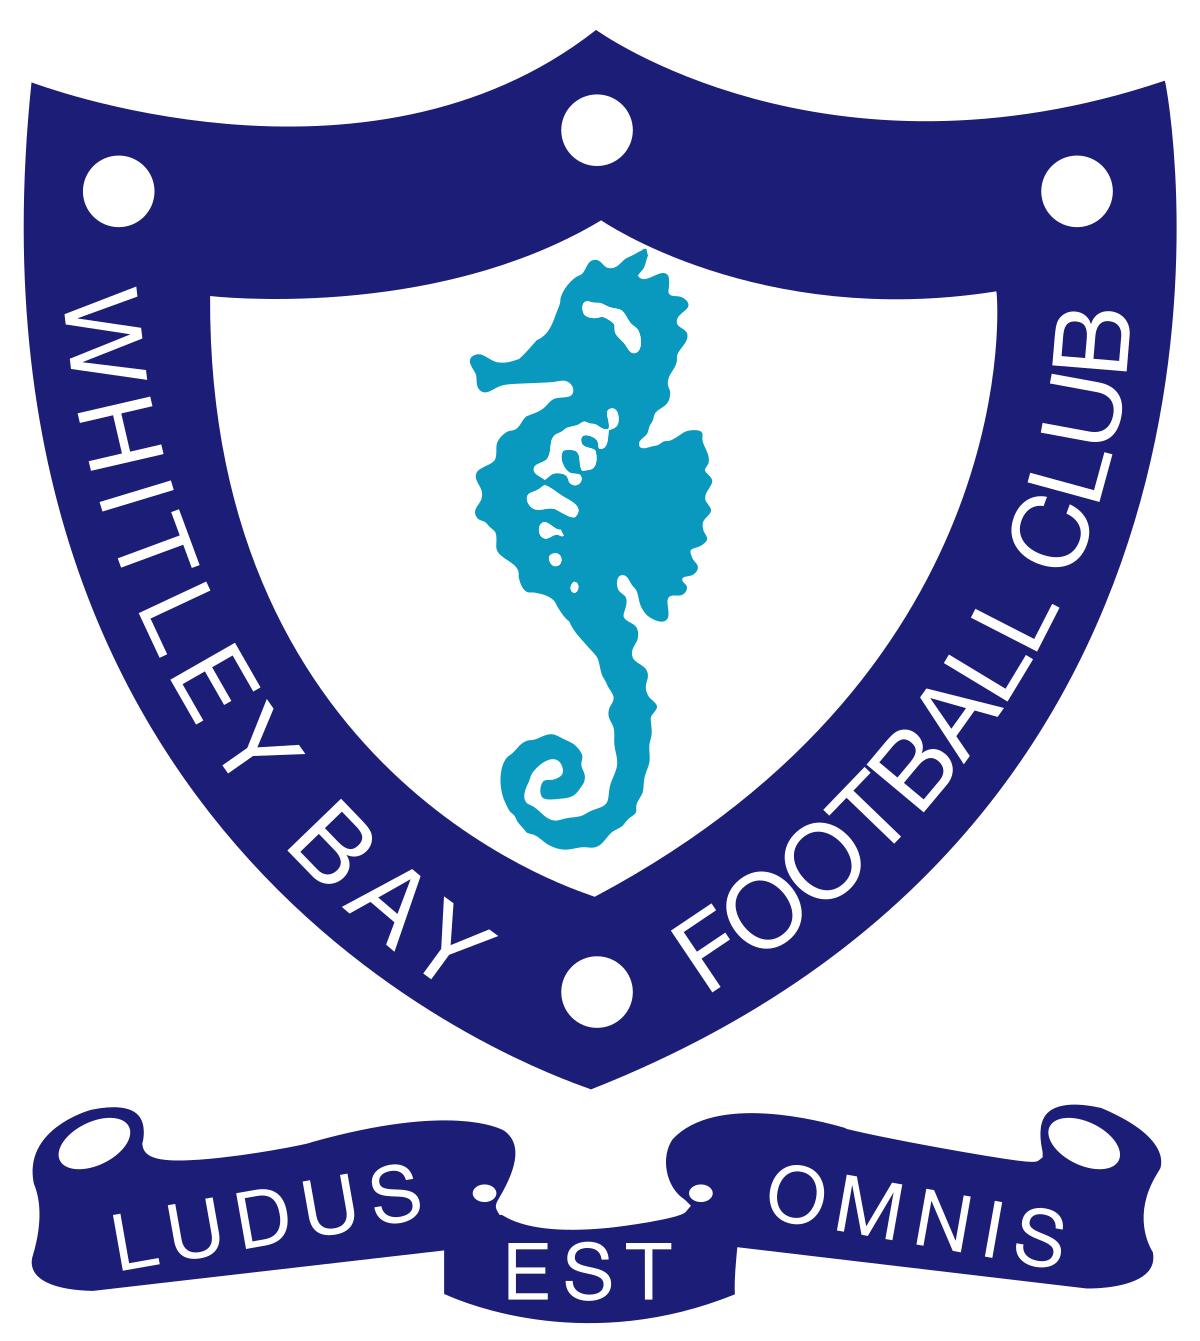 Whitley Bay crest